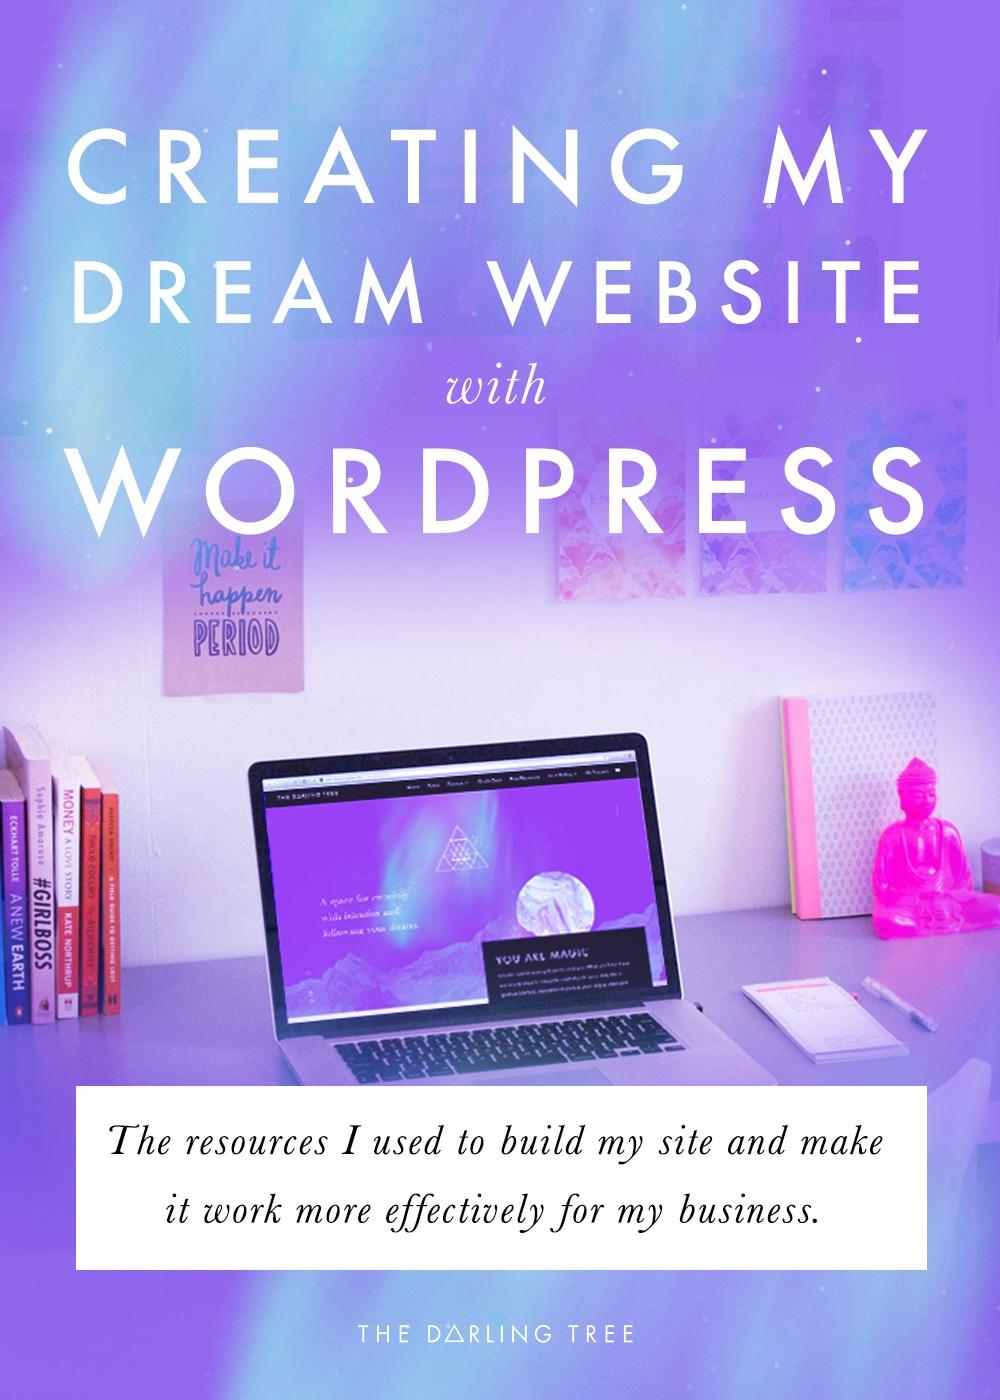 Creating my dream website with WordPress